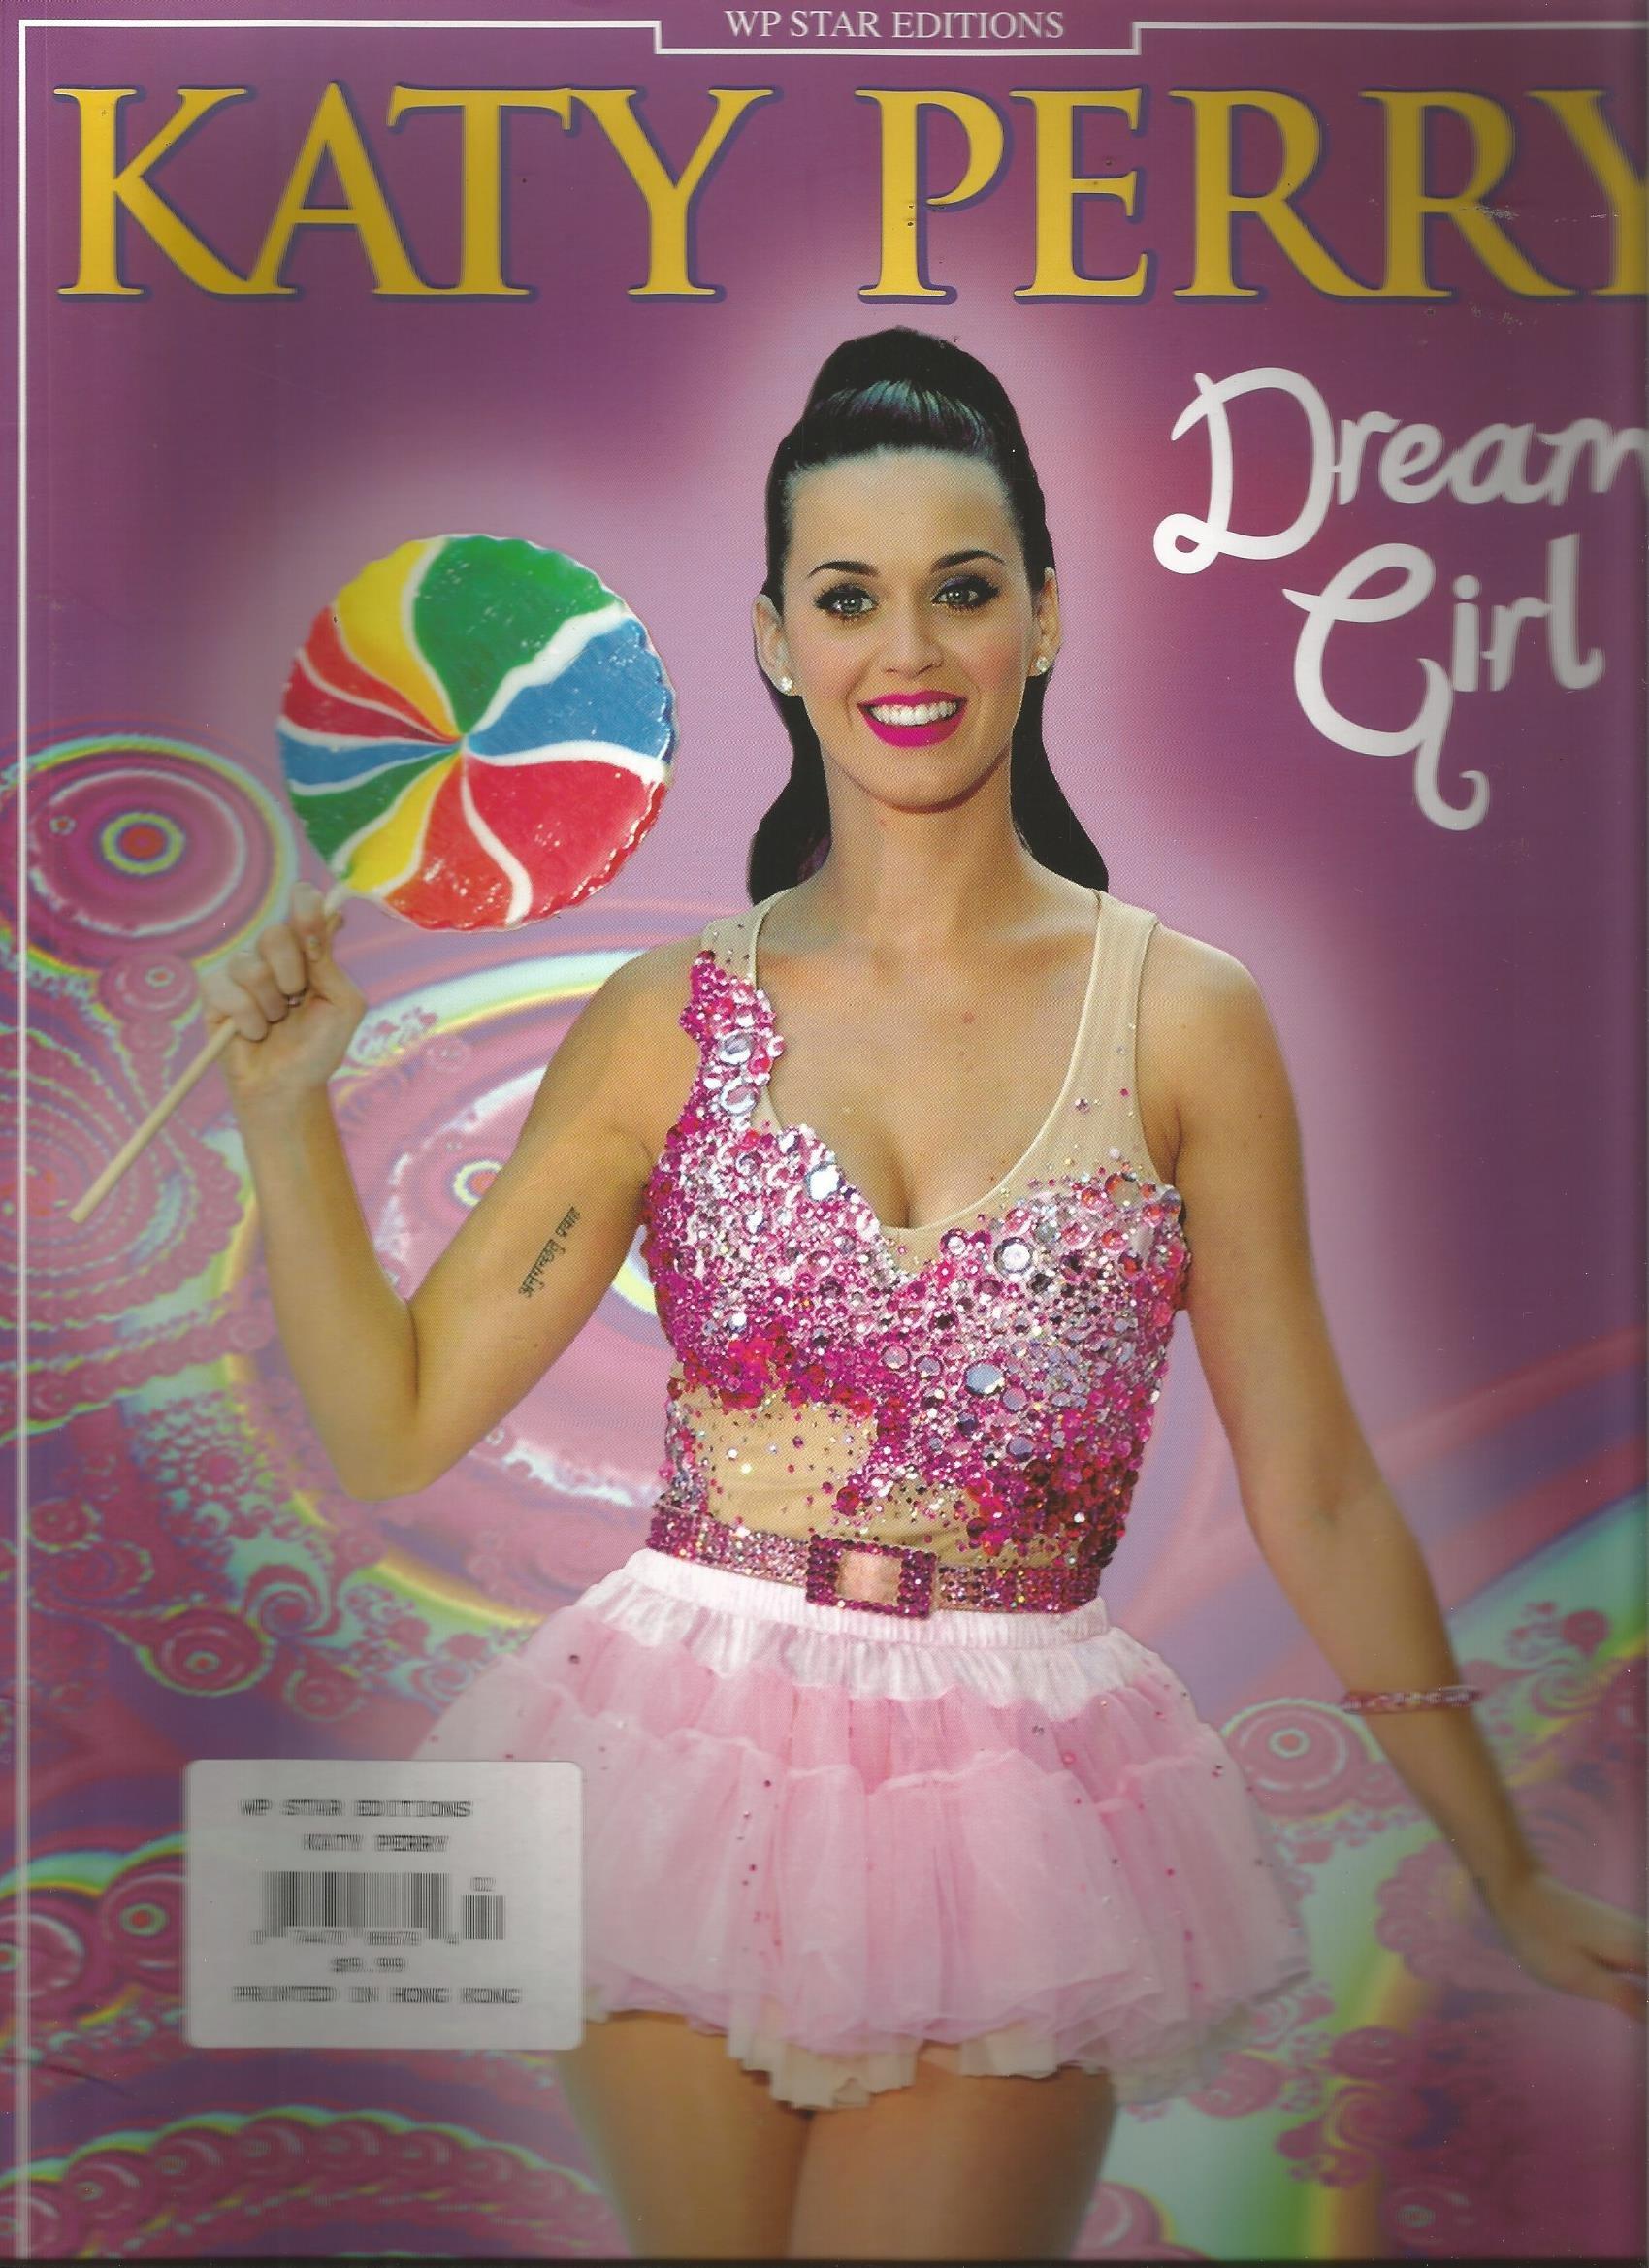 Download Katy Perry Dream Girl Magazine (WP Star Editions) pdf epub